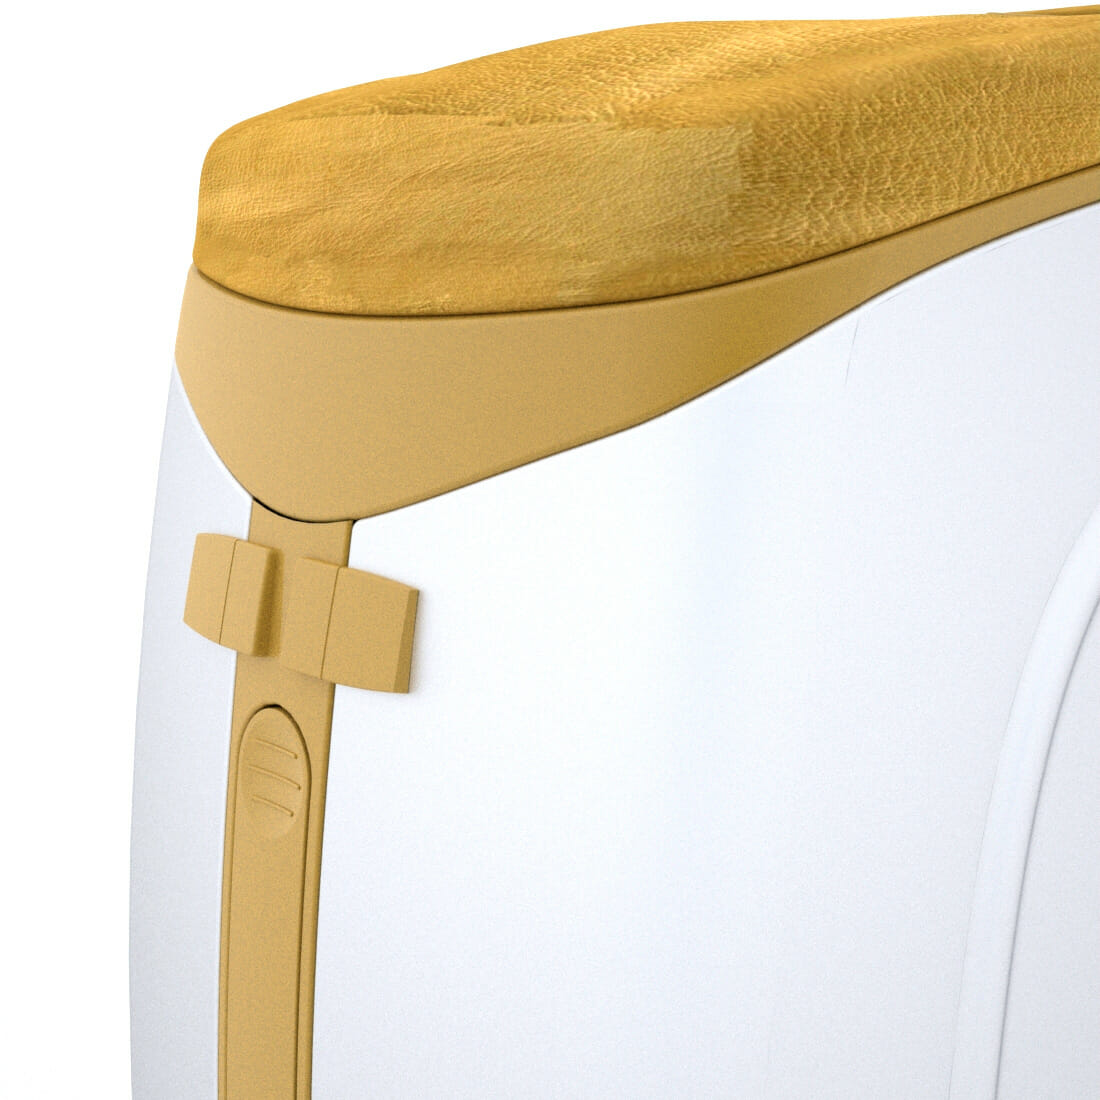 SITTY Trolley by QUIRIZ Designers Samantha Dereviriz e Alberto De Siati